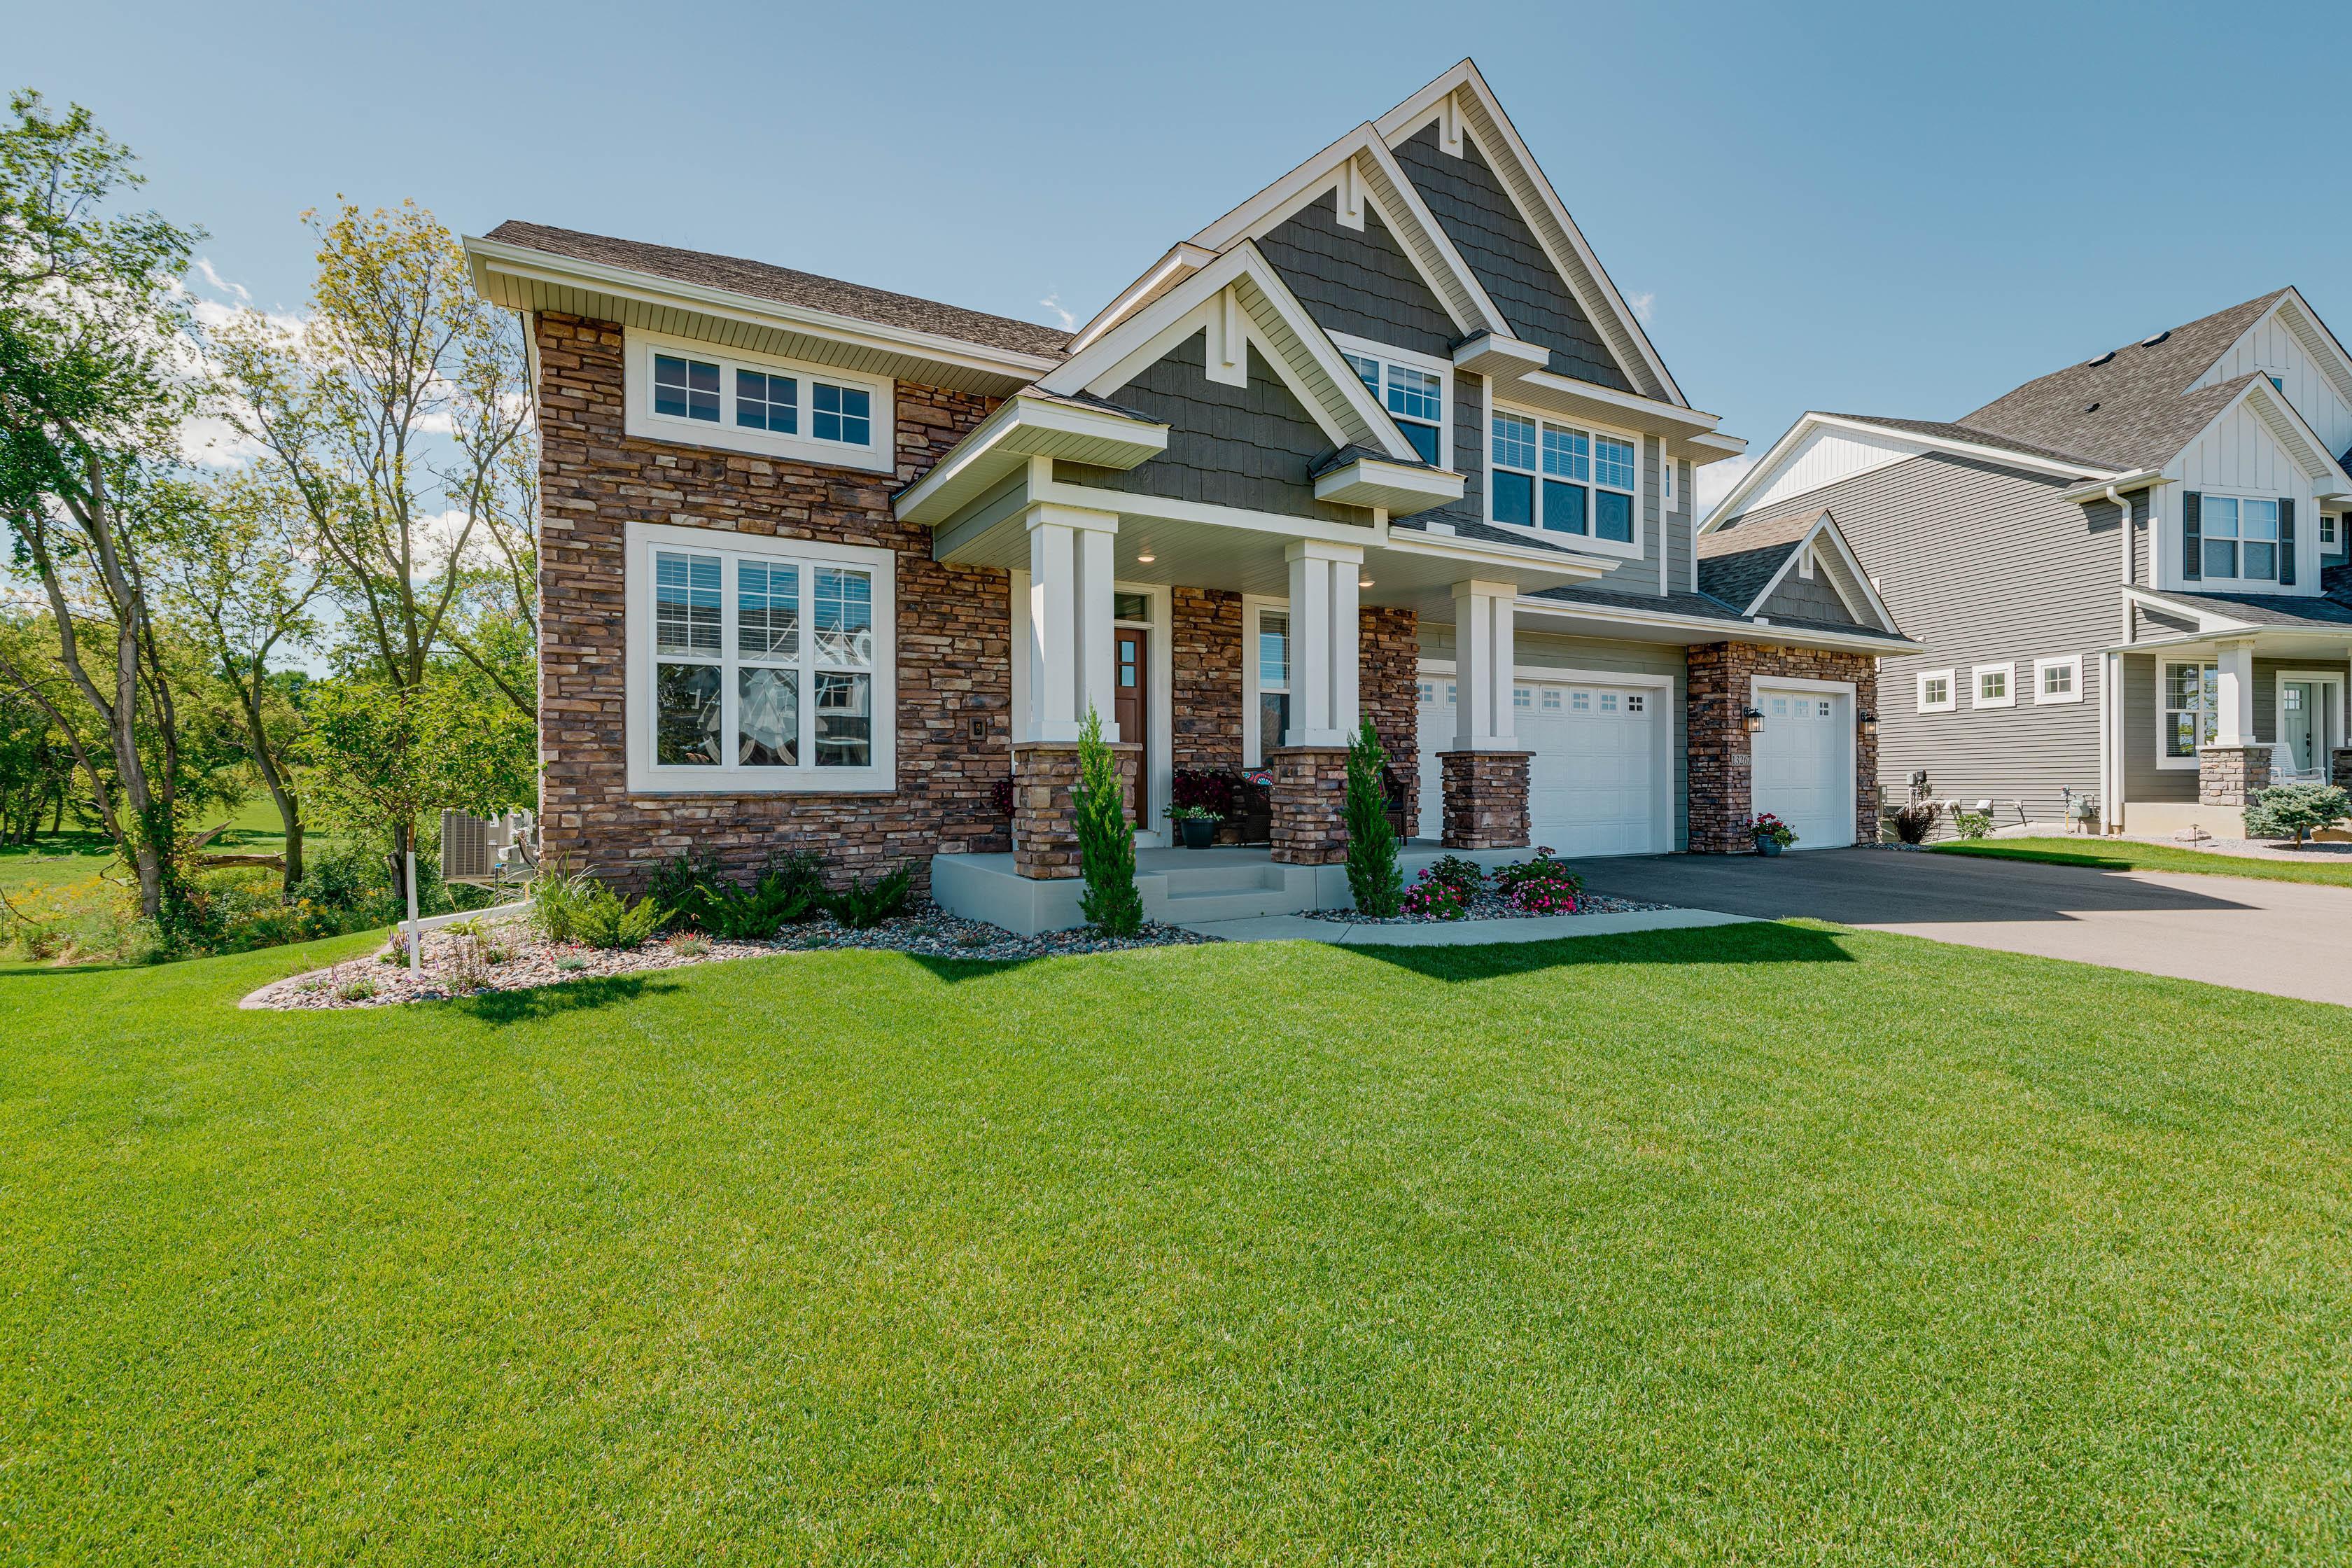 13267 Aulden Avenue Property Photo - Rosemount, MN real estate listing